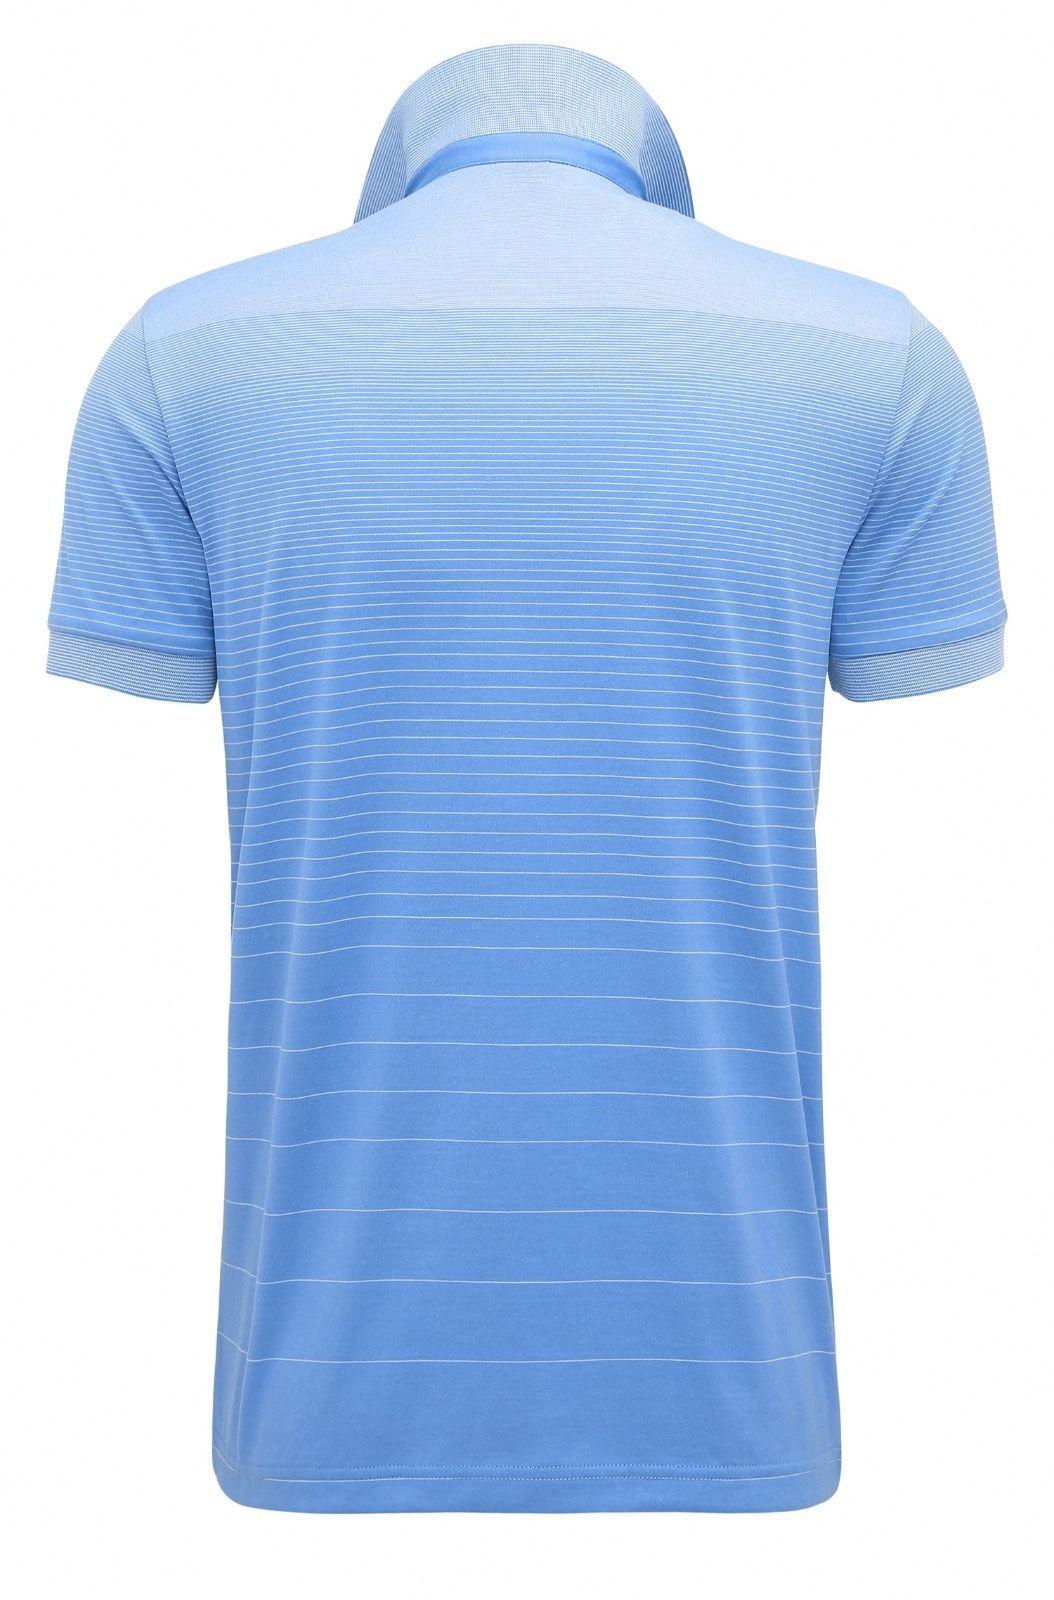 Hugo Boss Men's C-Janis Sport Cotton Regular Fit Polo Shirt T-shirt 50369676